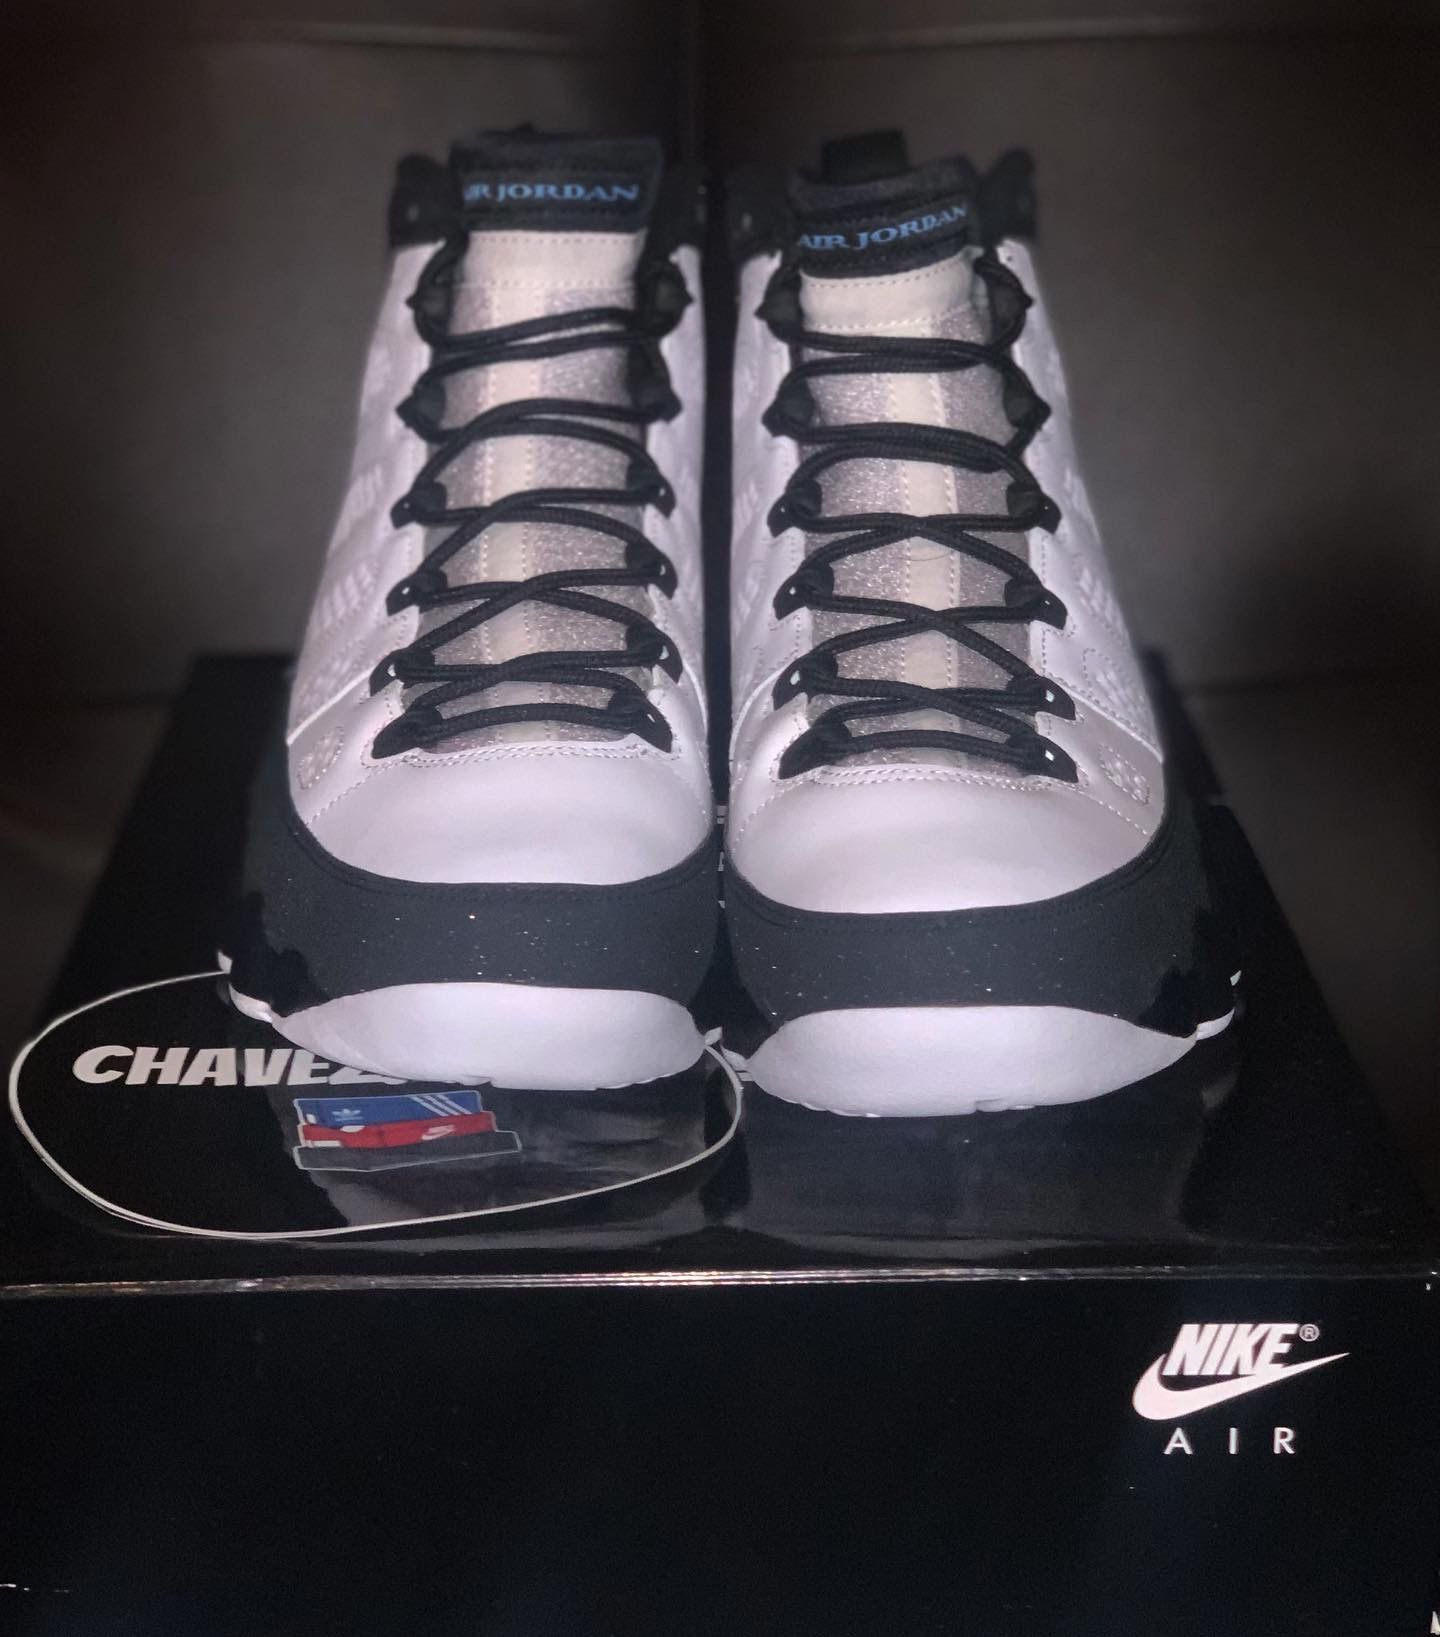 Air Jordan 9 UNC Size 10 Brand New